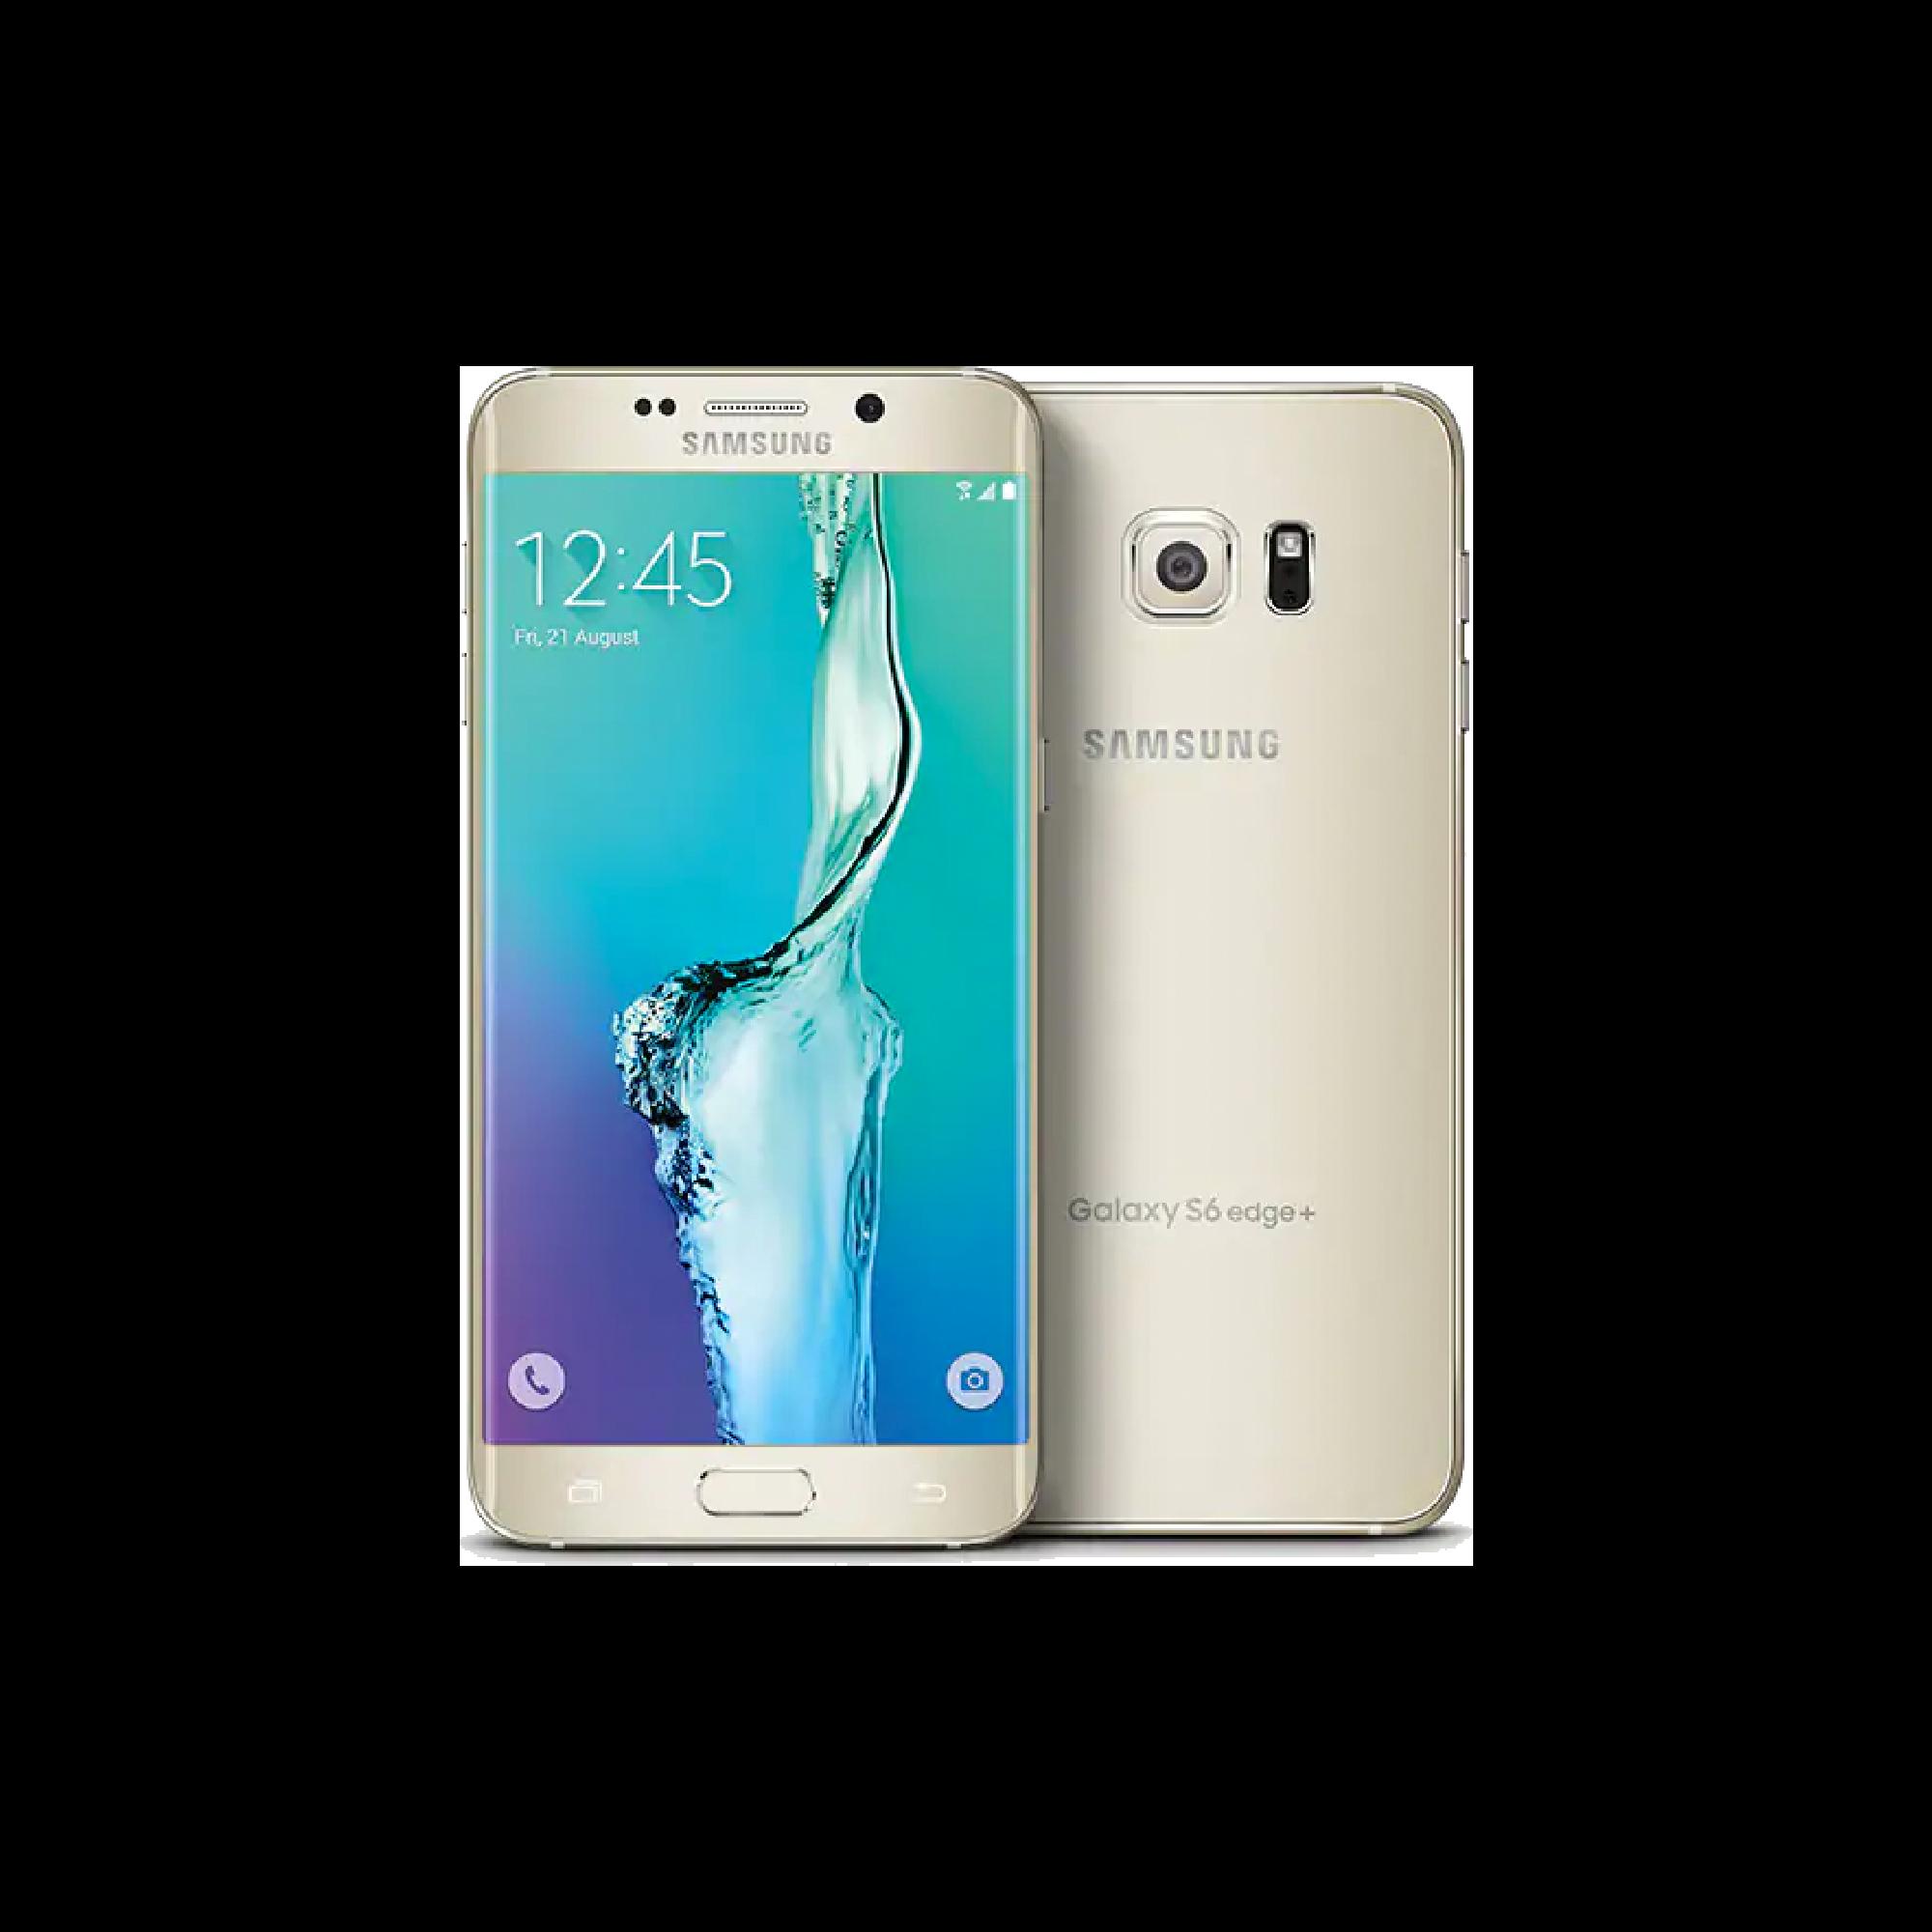 Samsung S6 Edge+ | $220 + tax